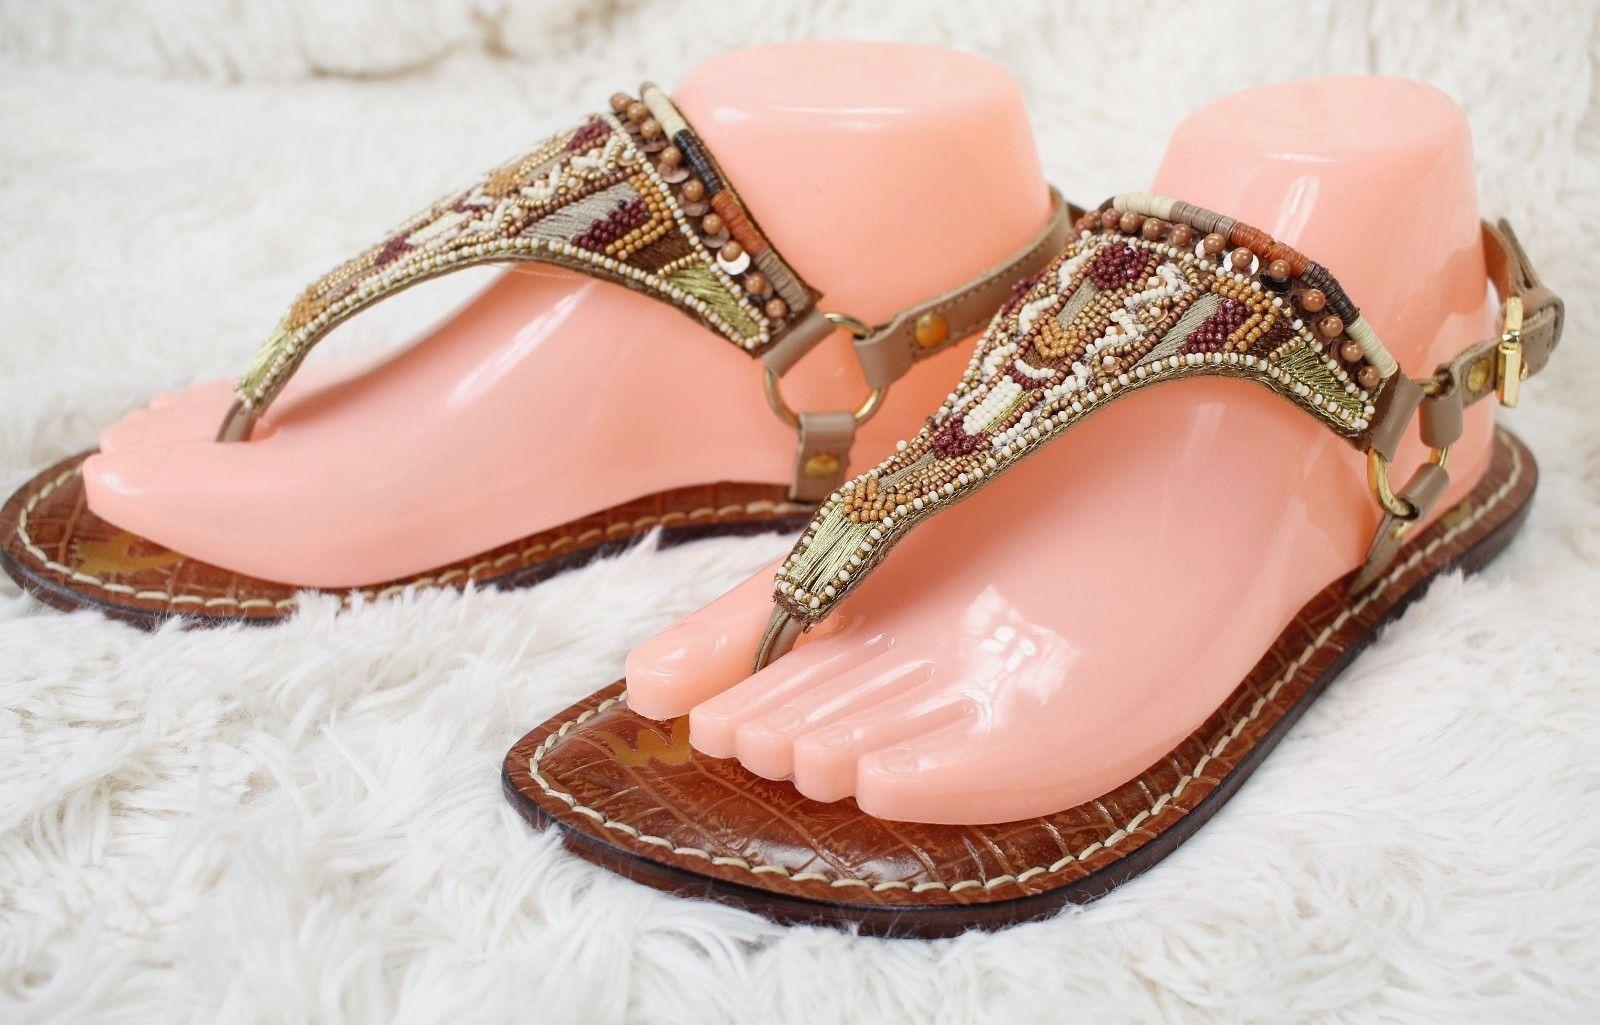 ed09c098a696 57. 57. Previous. SAM EDELMAN Metallic Beaded Buckle Thong Sandals Flip  Flops Women s Size 8 Brown